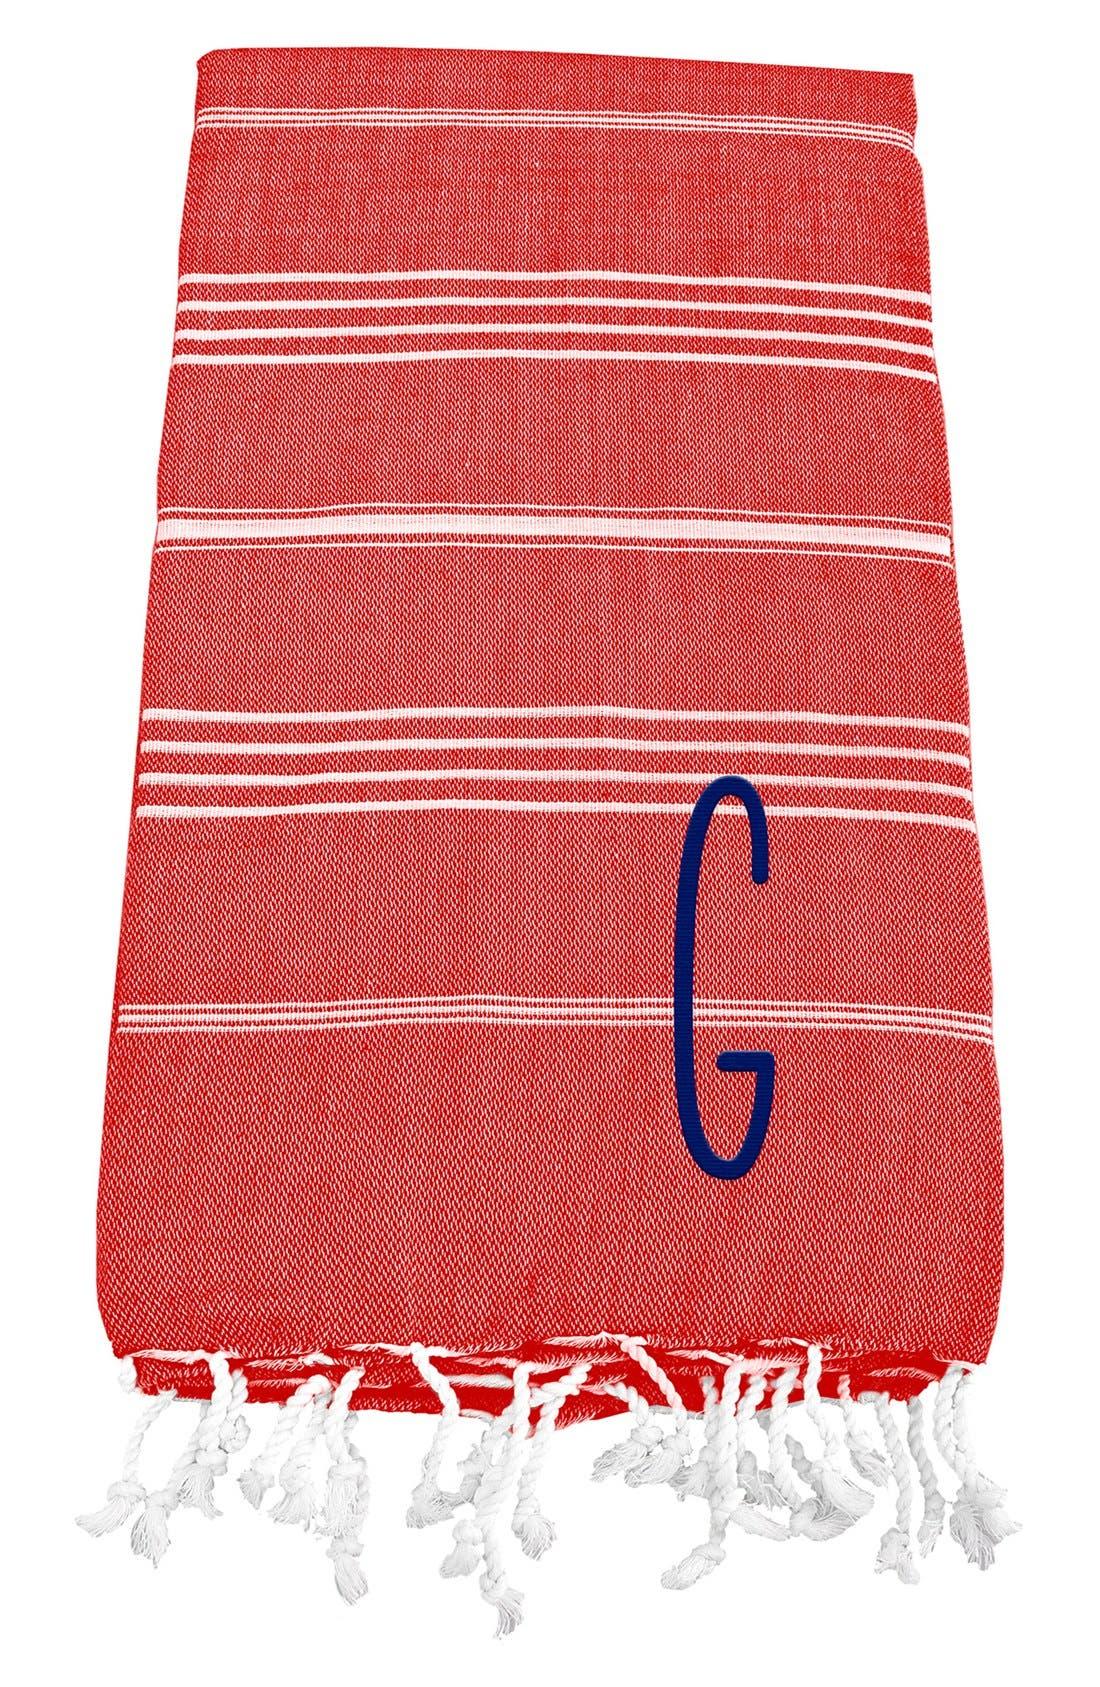 Monogram Turkish Cotton Towel,                             Main thumbnail 116, color,